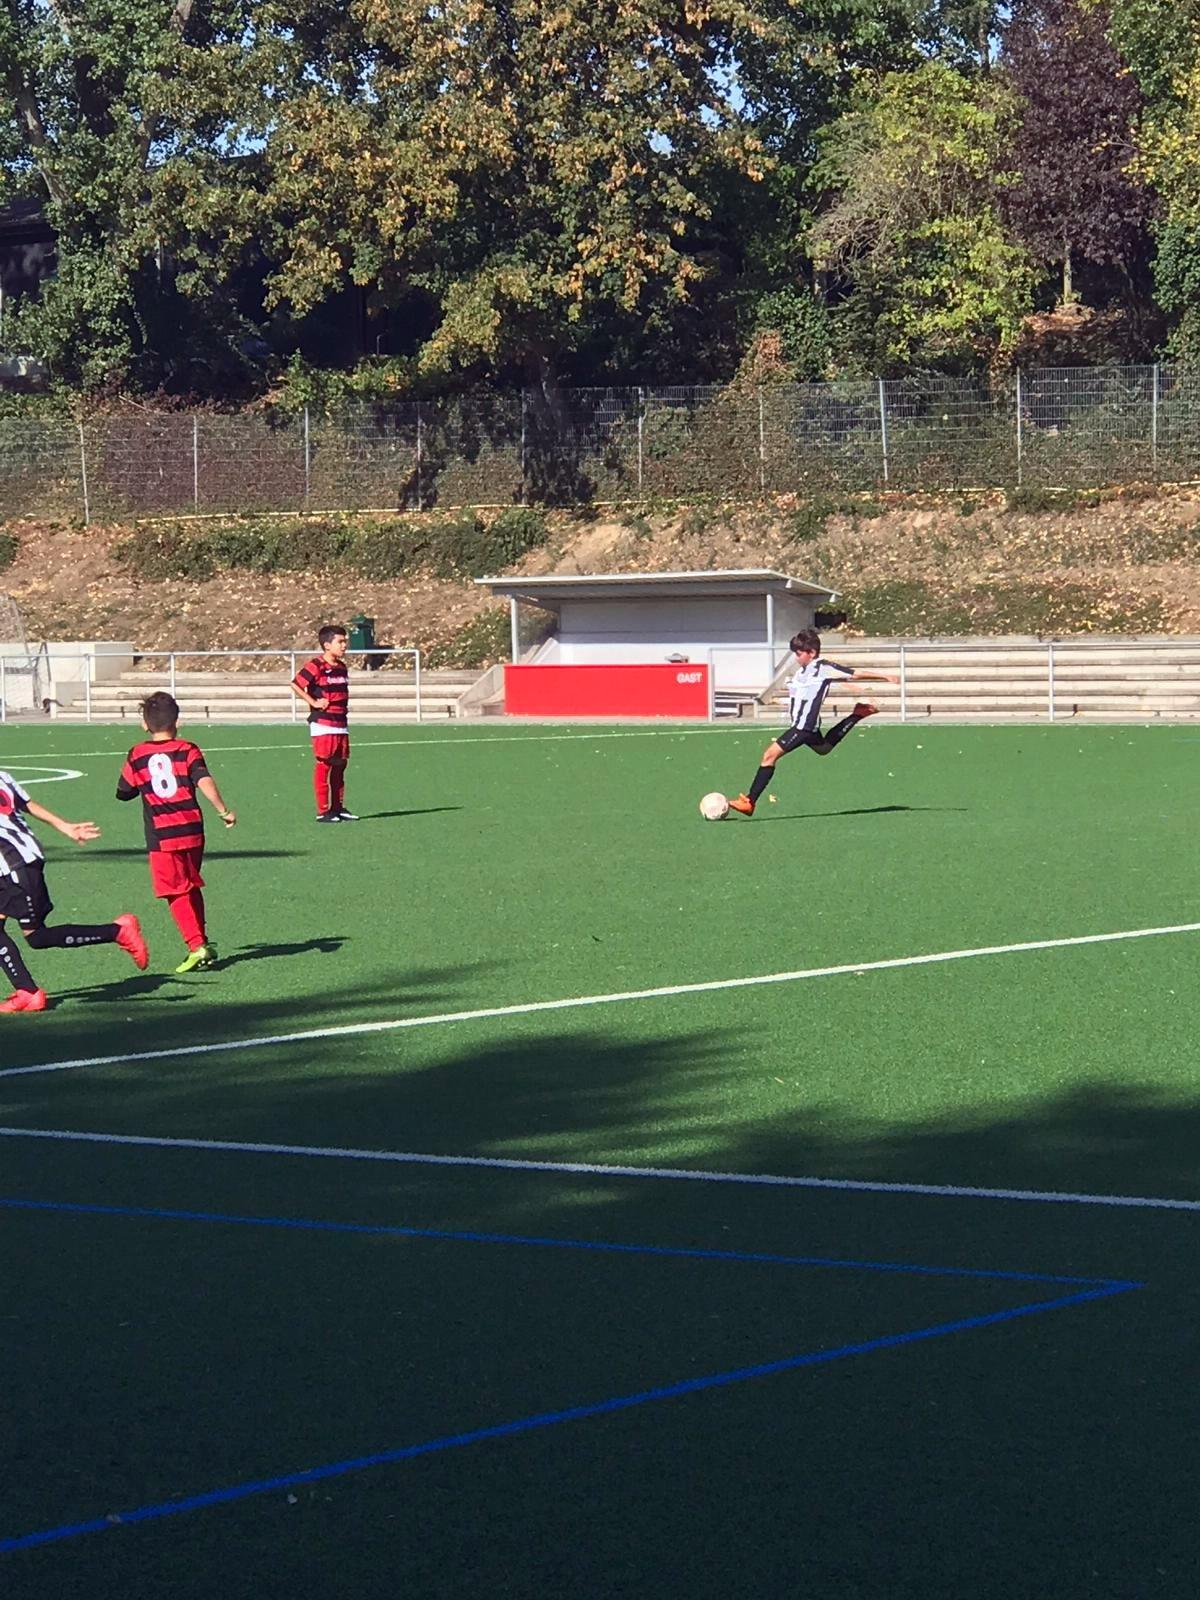 E3 – spielte gegen SV Rot-Weiß Mülheim.